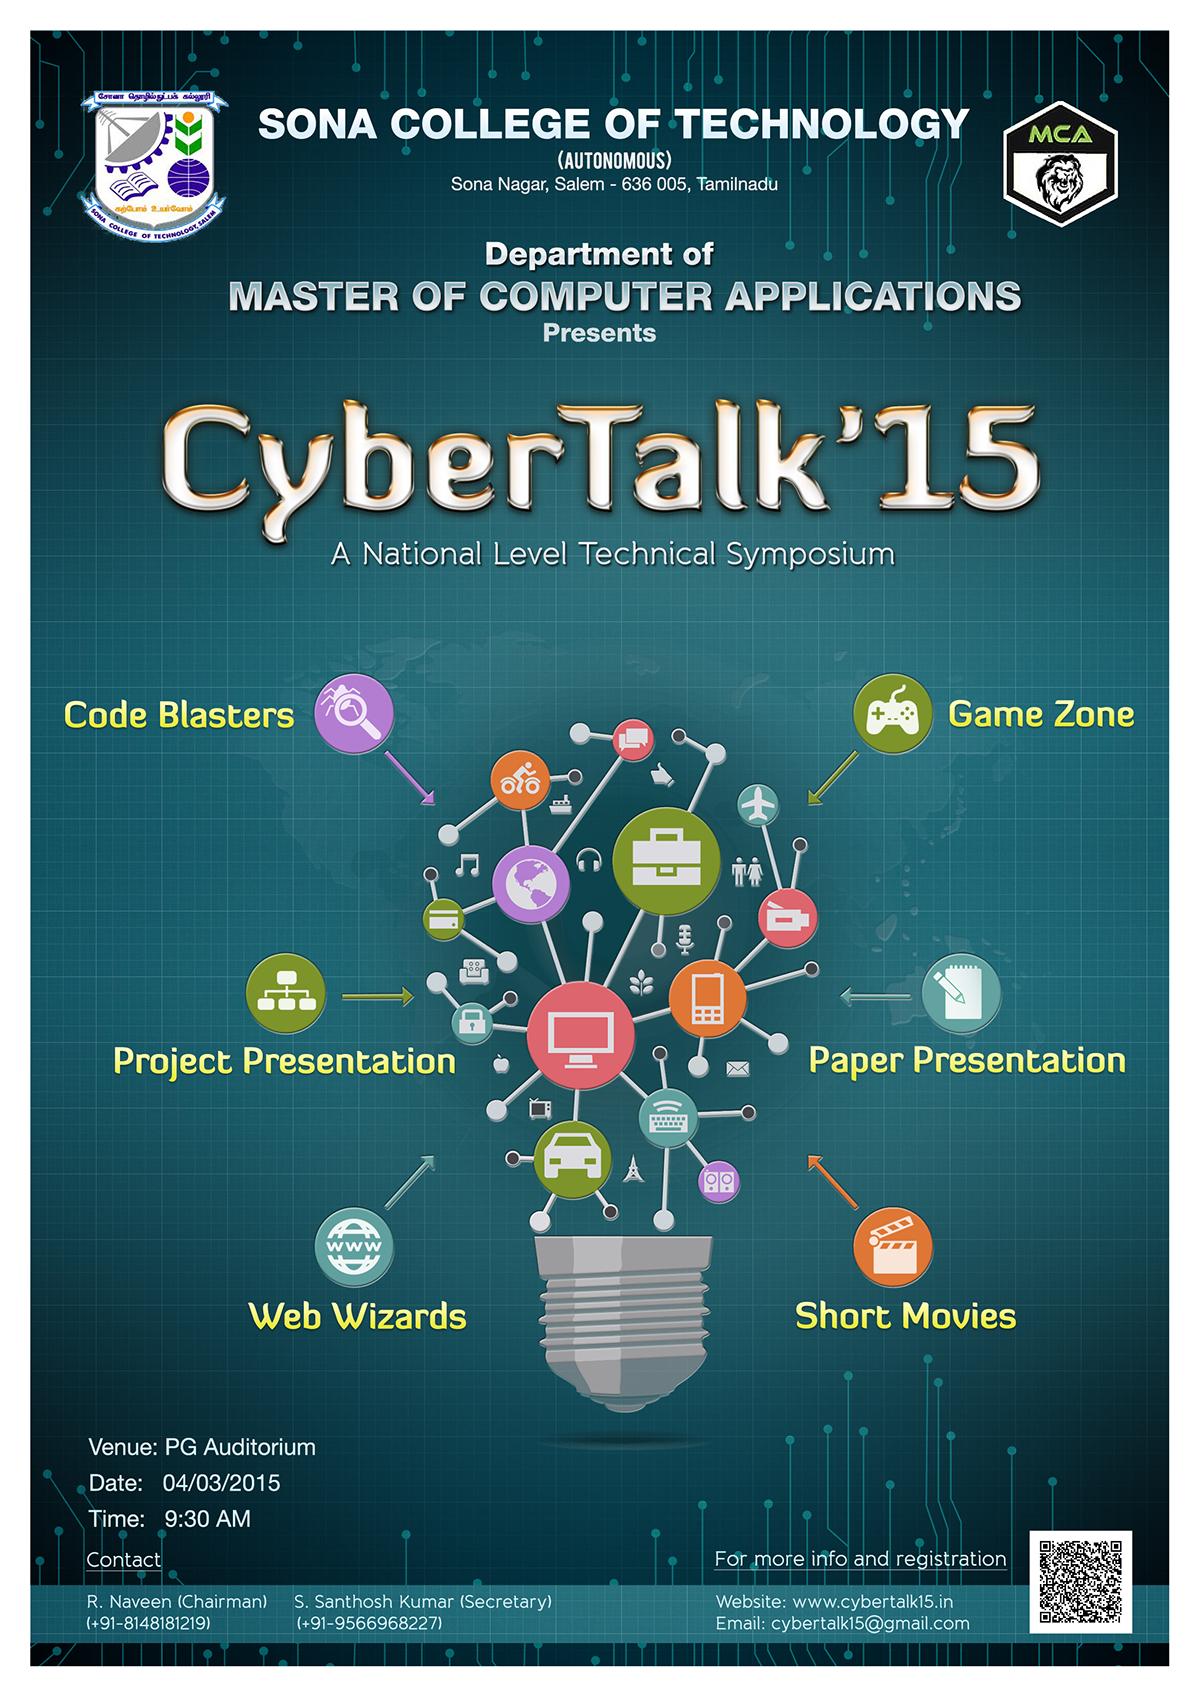 symposium Exhibition  sona college Cybertalk salem india